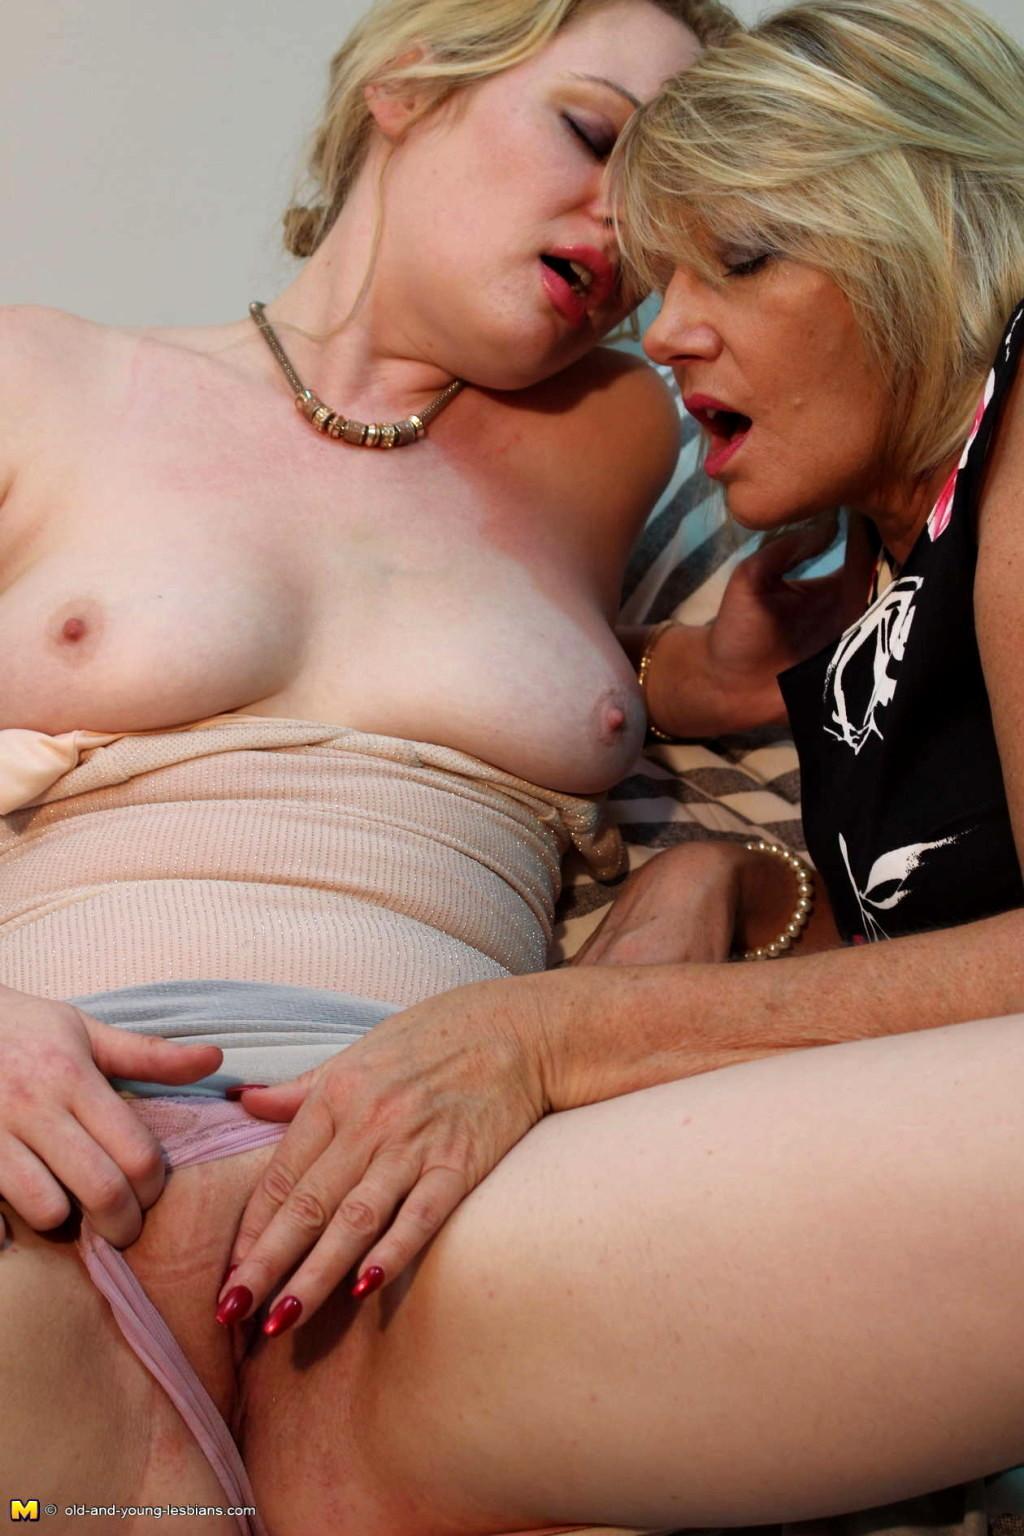 Old lady lesbian sex